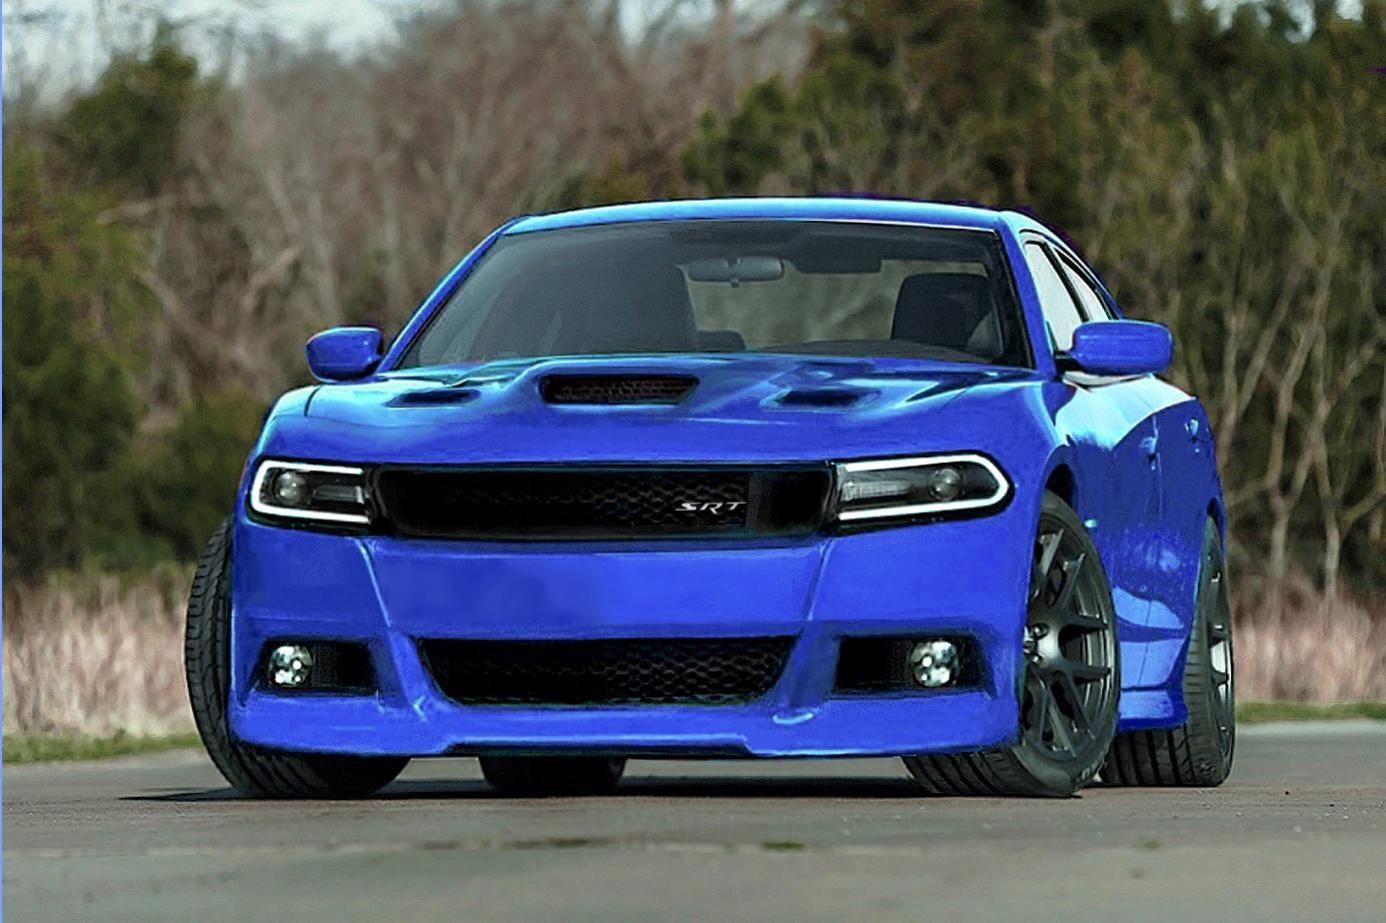 b5 blue dodge charger hellcat - Dodge Charger 2014 Dark Blue